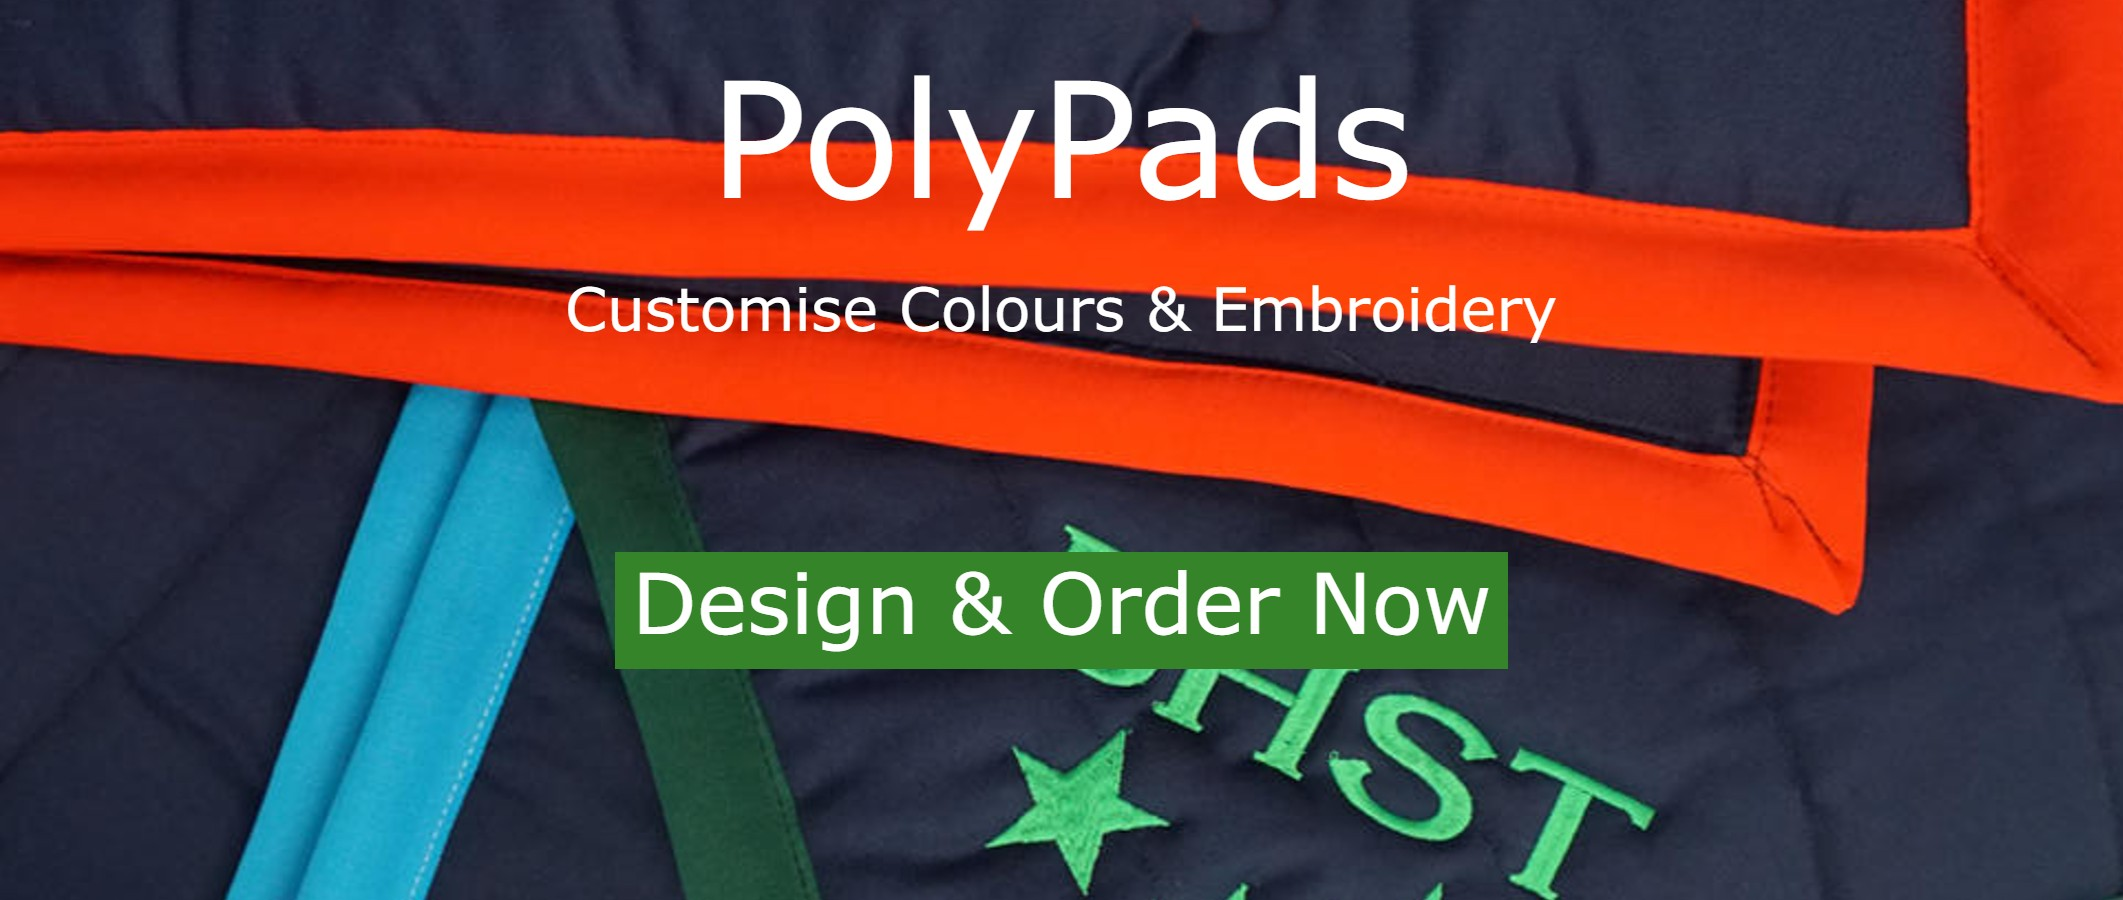 Customise Polypads